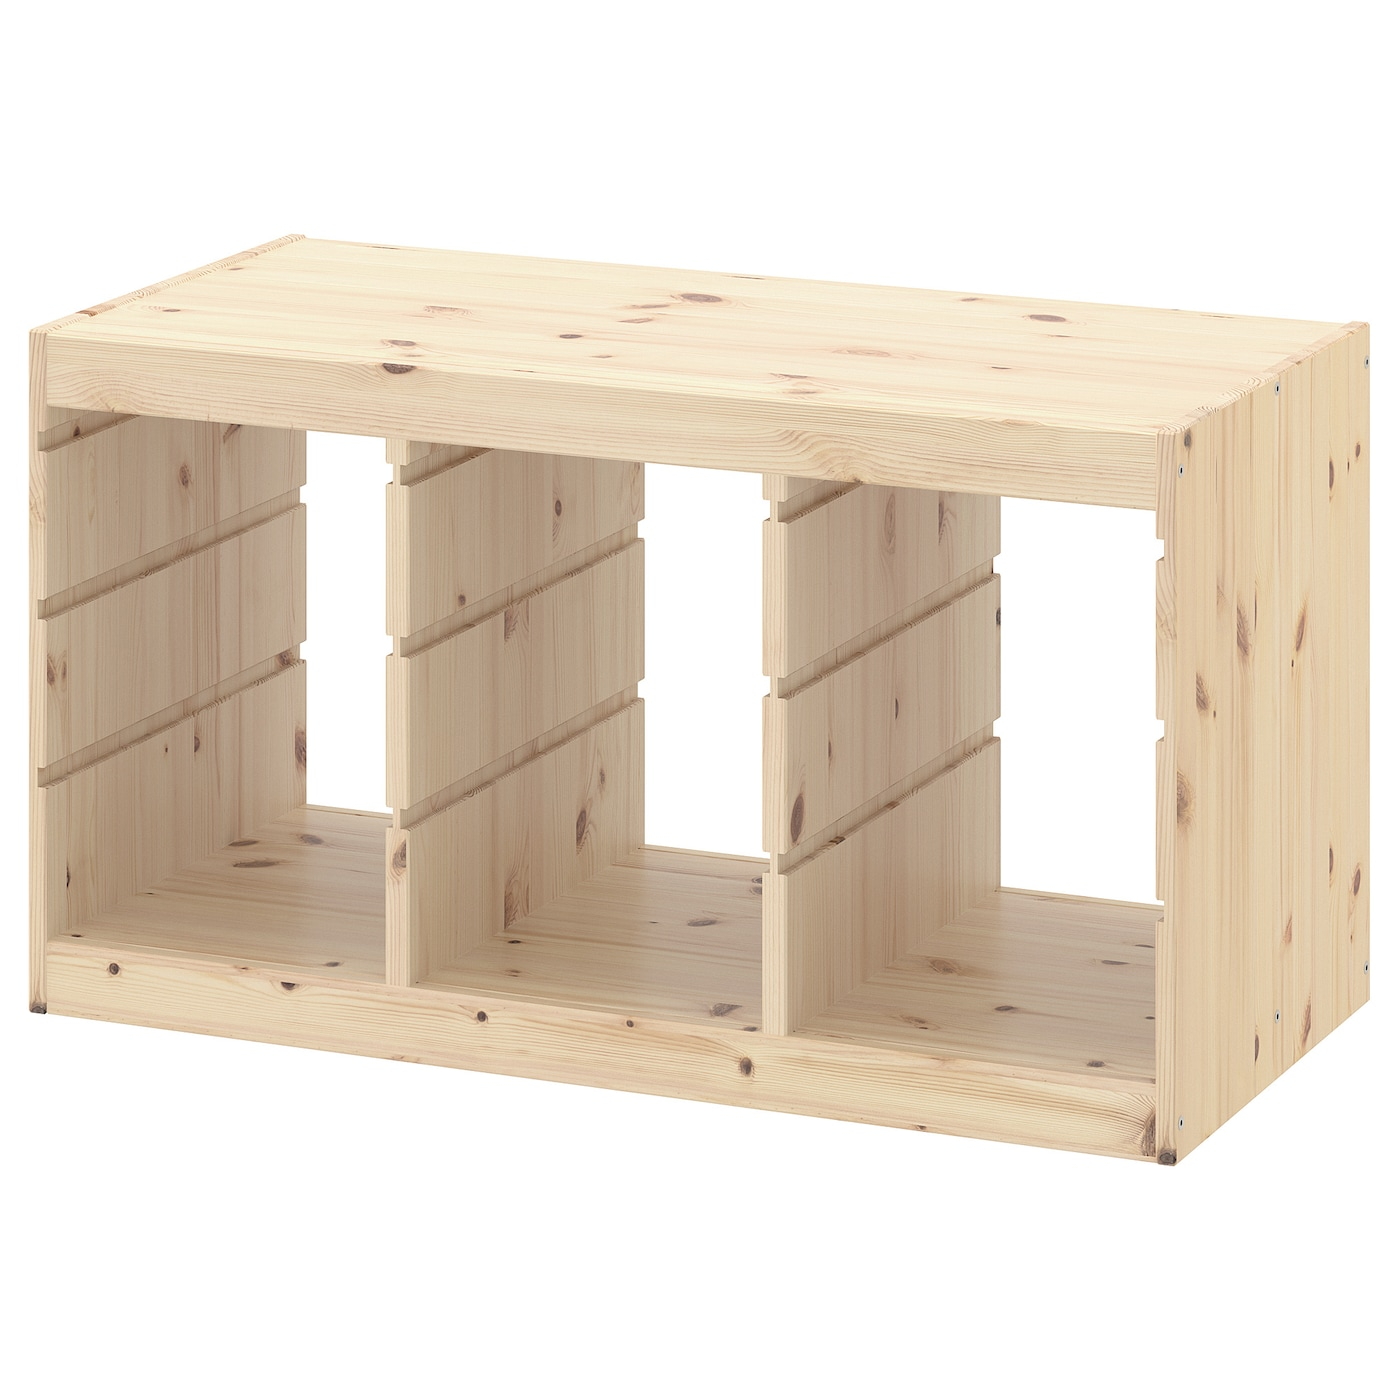 IKEA Regalrahmen 99x44x56 cm Aufbewahrung Kinder Regal Rahmen weiß Ordnung Neu